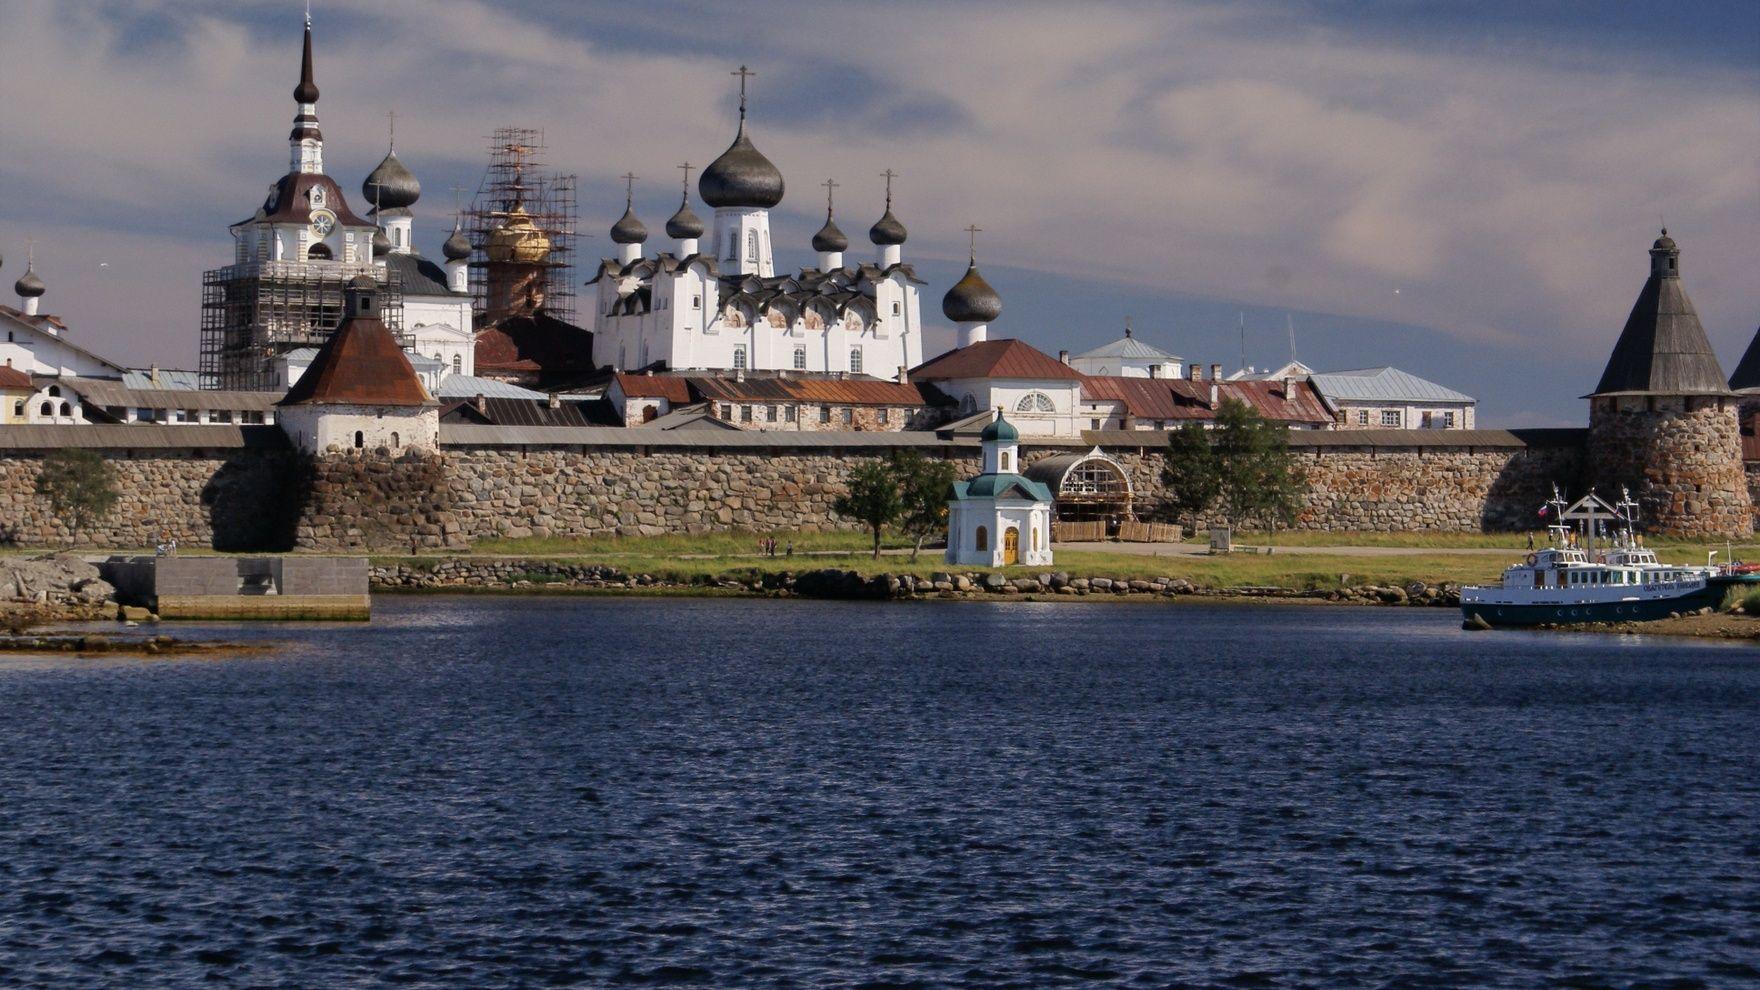 Поход на яхте: Белое море и Беломоро-Балтийский канал